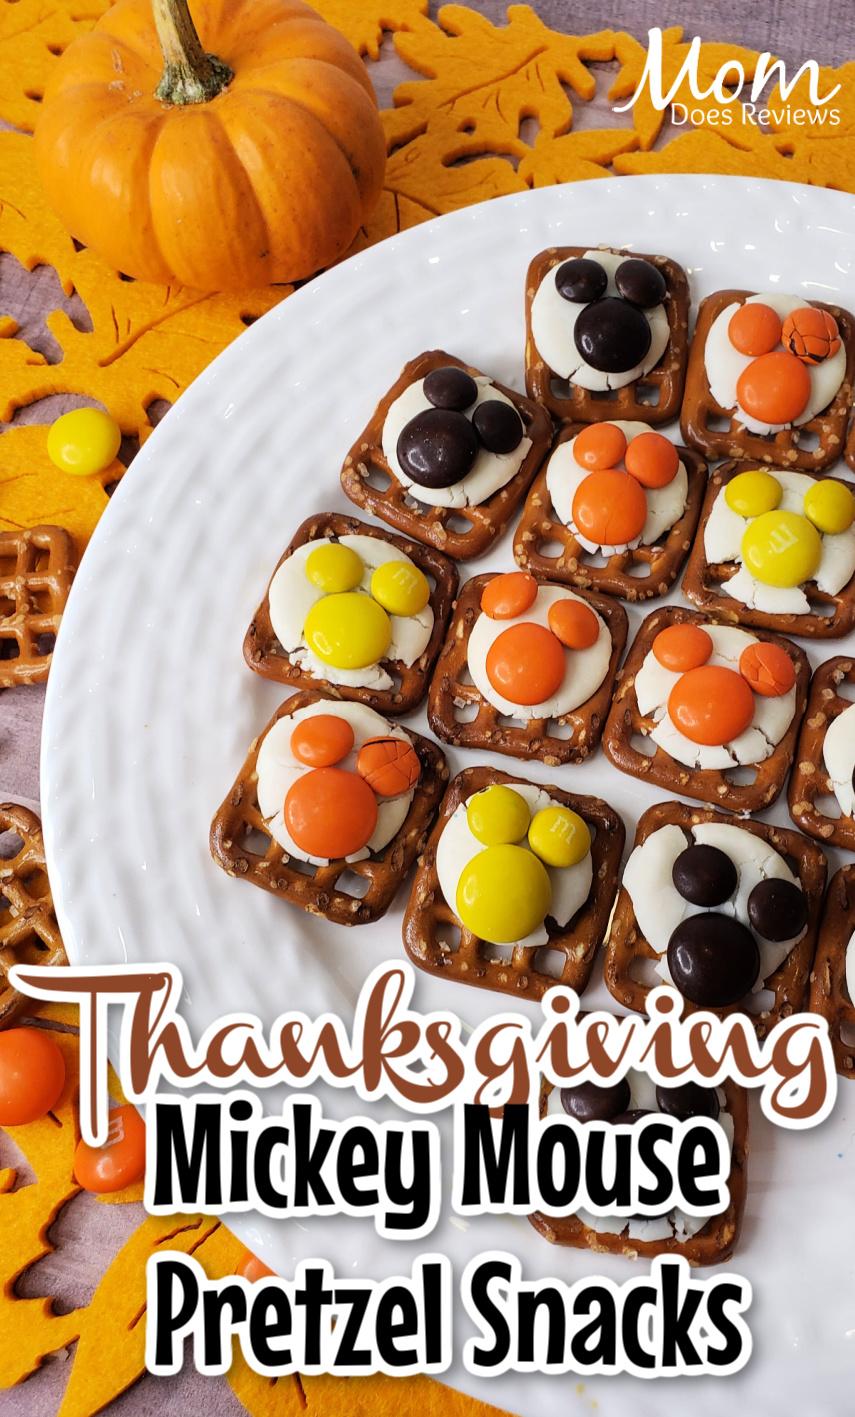 Thanksgiving Mickey Mouse Pretzel Bites #funfood #recipe #snacks #mickeymouse